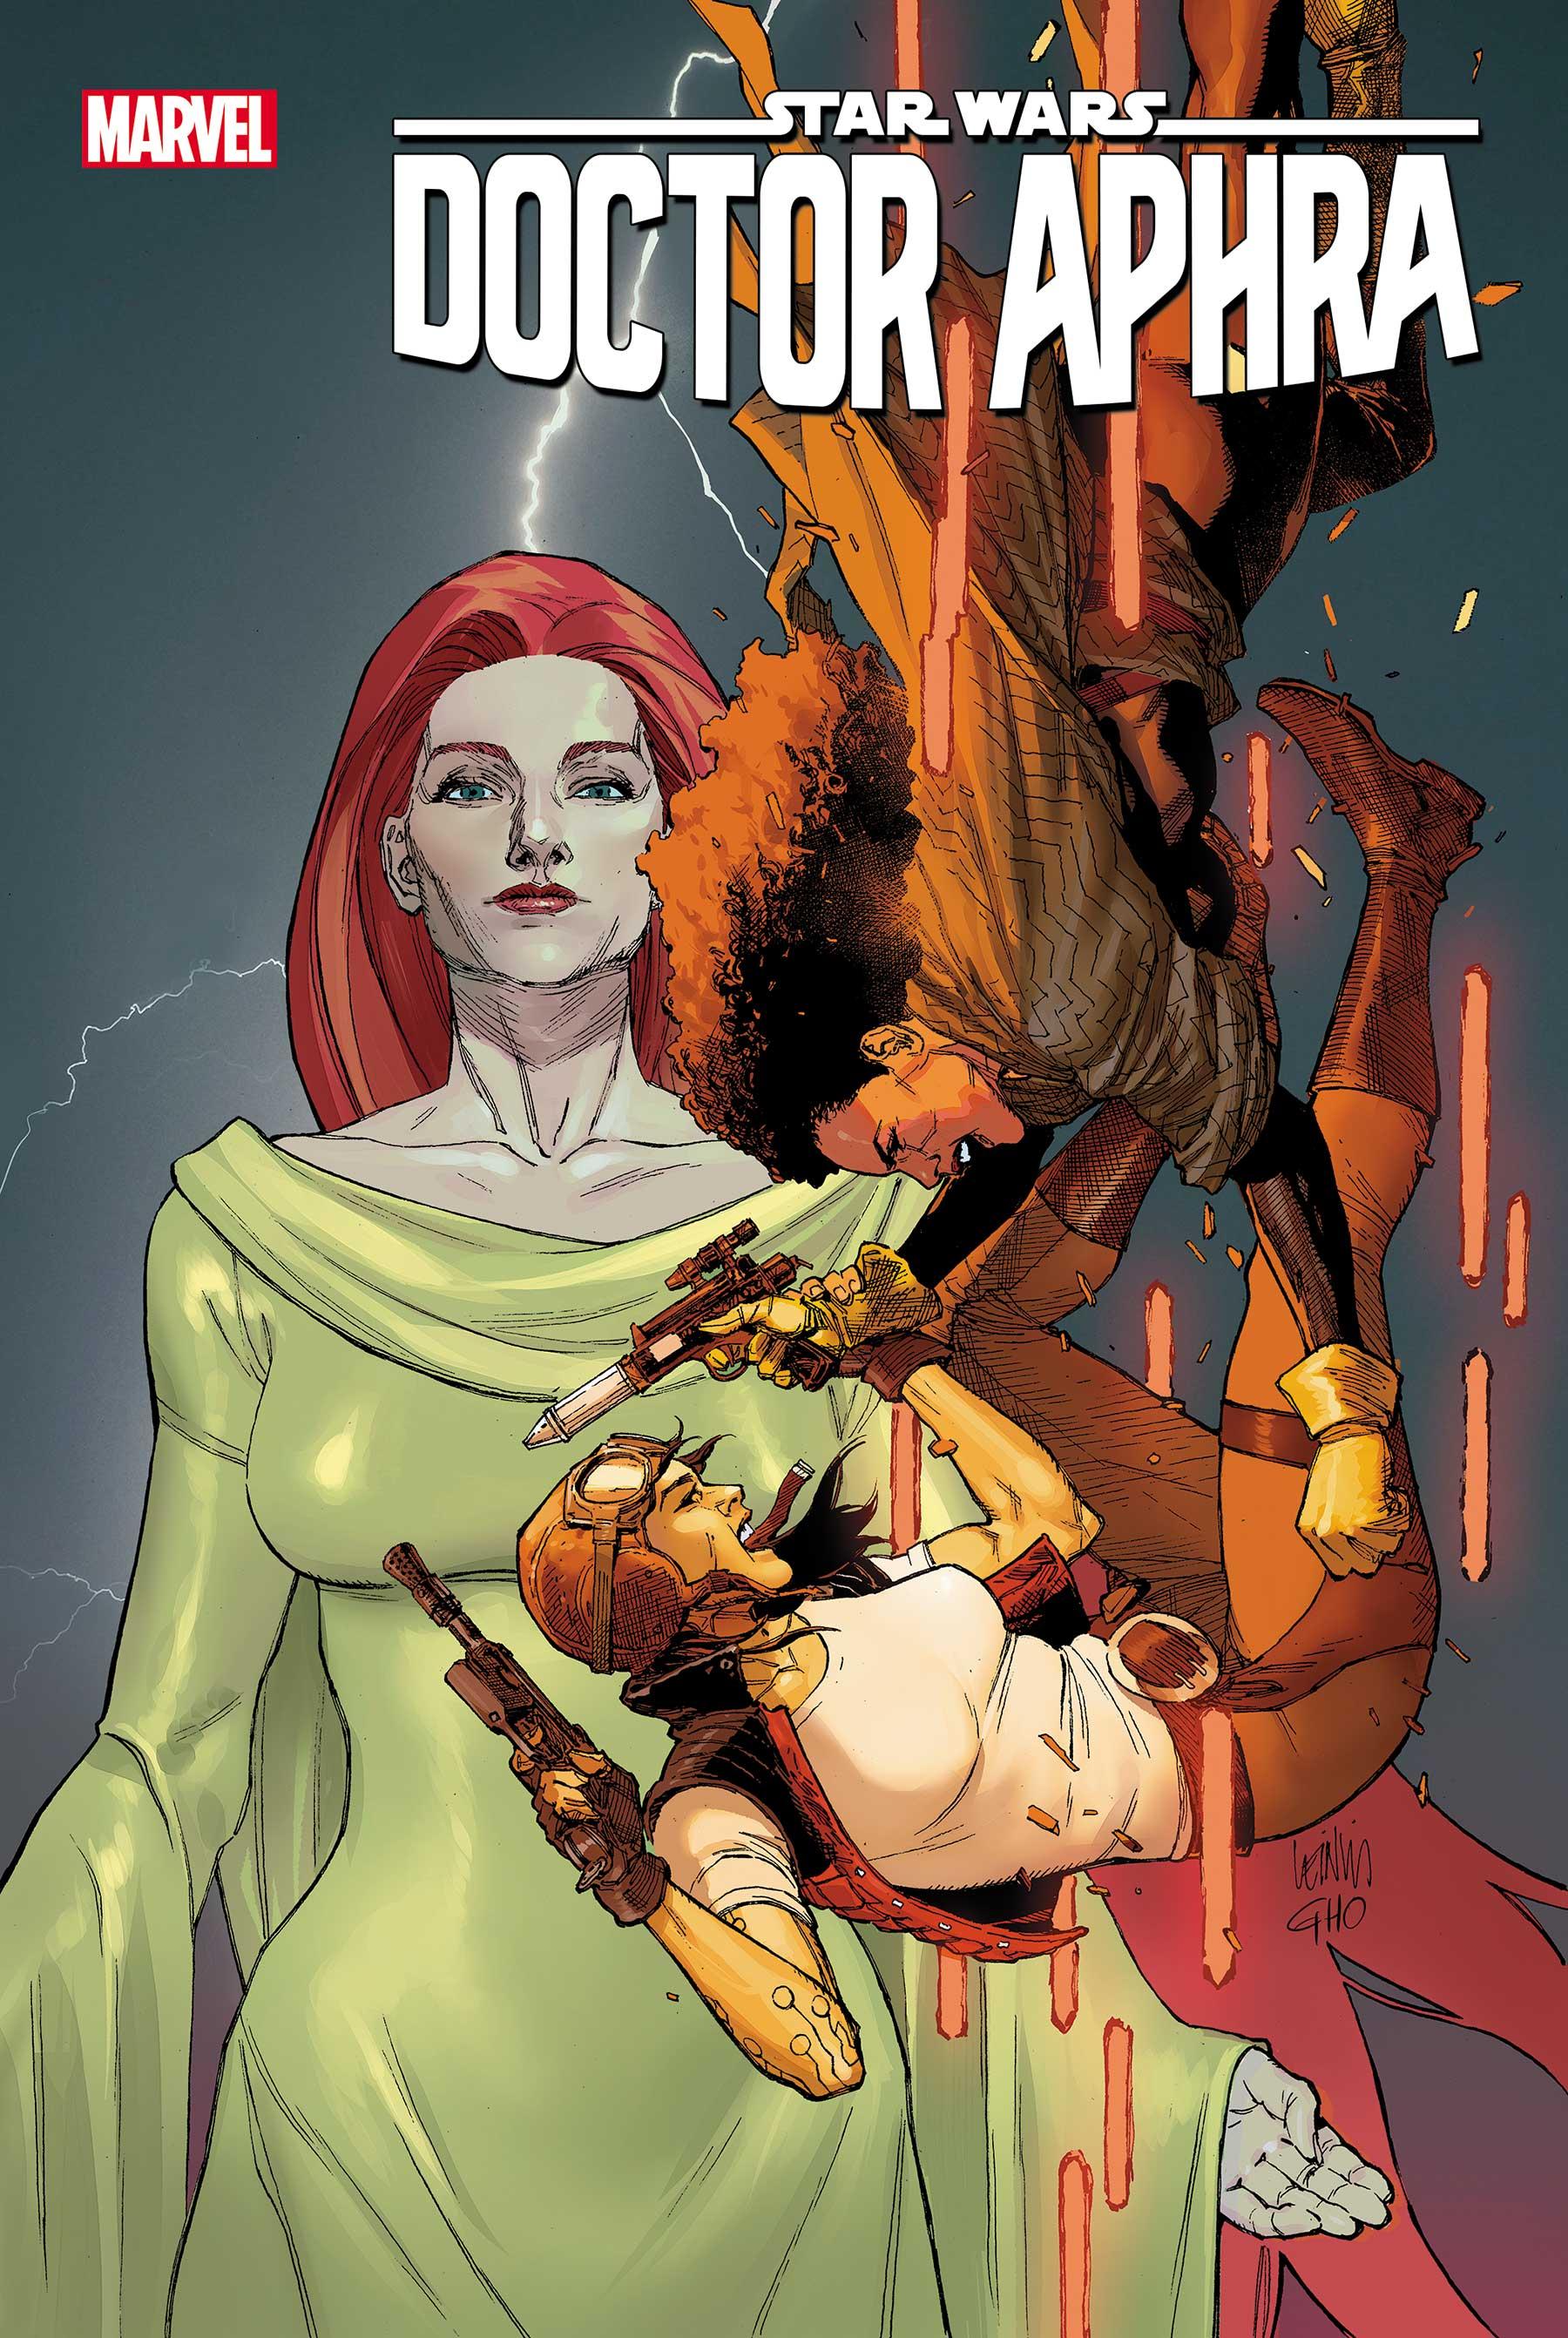 Star Wars: Doctor Aphra (2020) #6